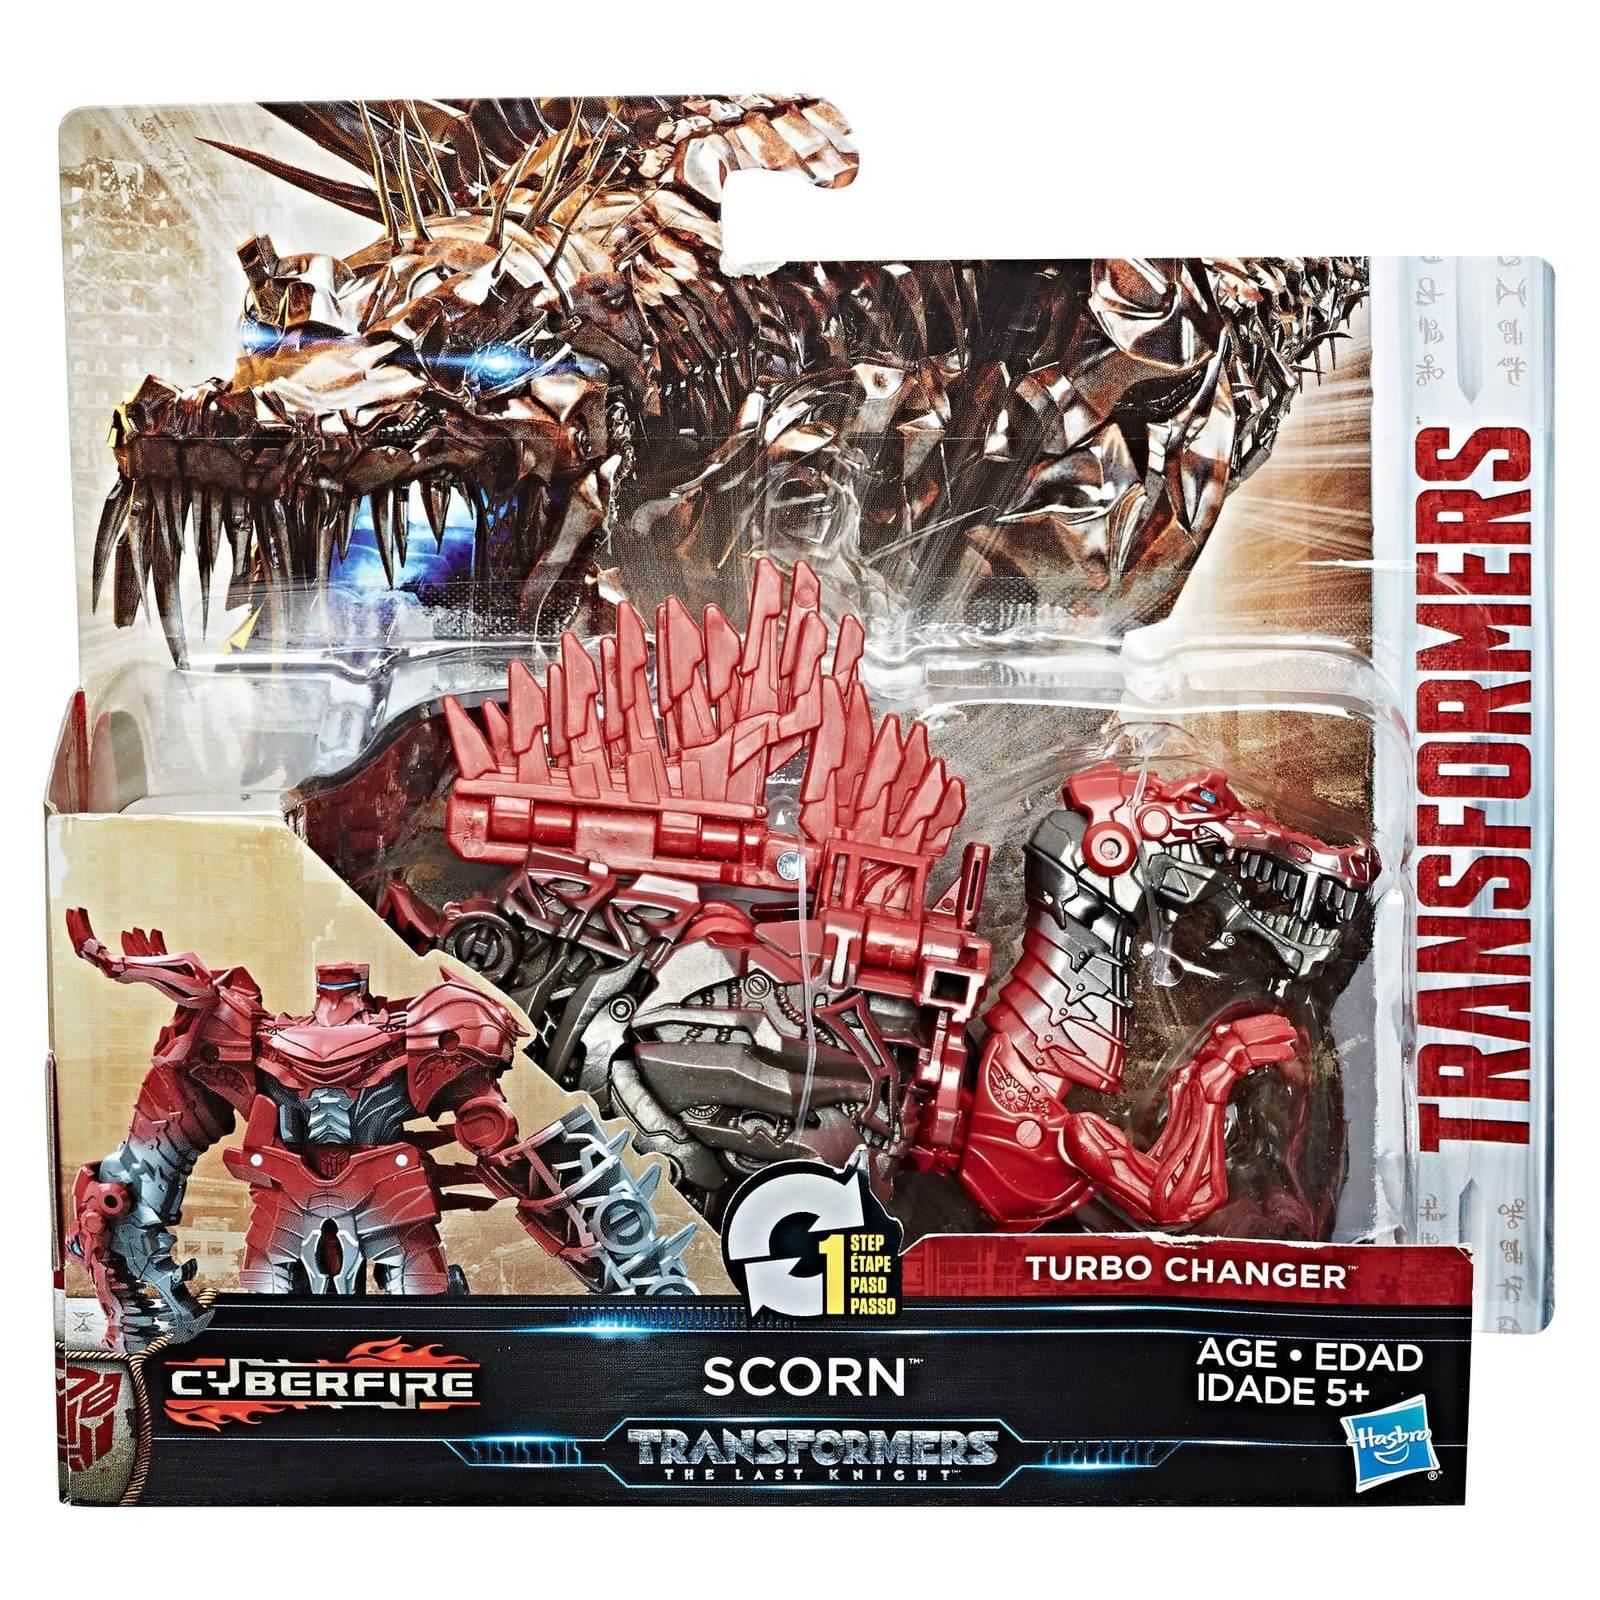 Transformers: The Last Knight: 1-Step Turbo Changer (Scorn) image